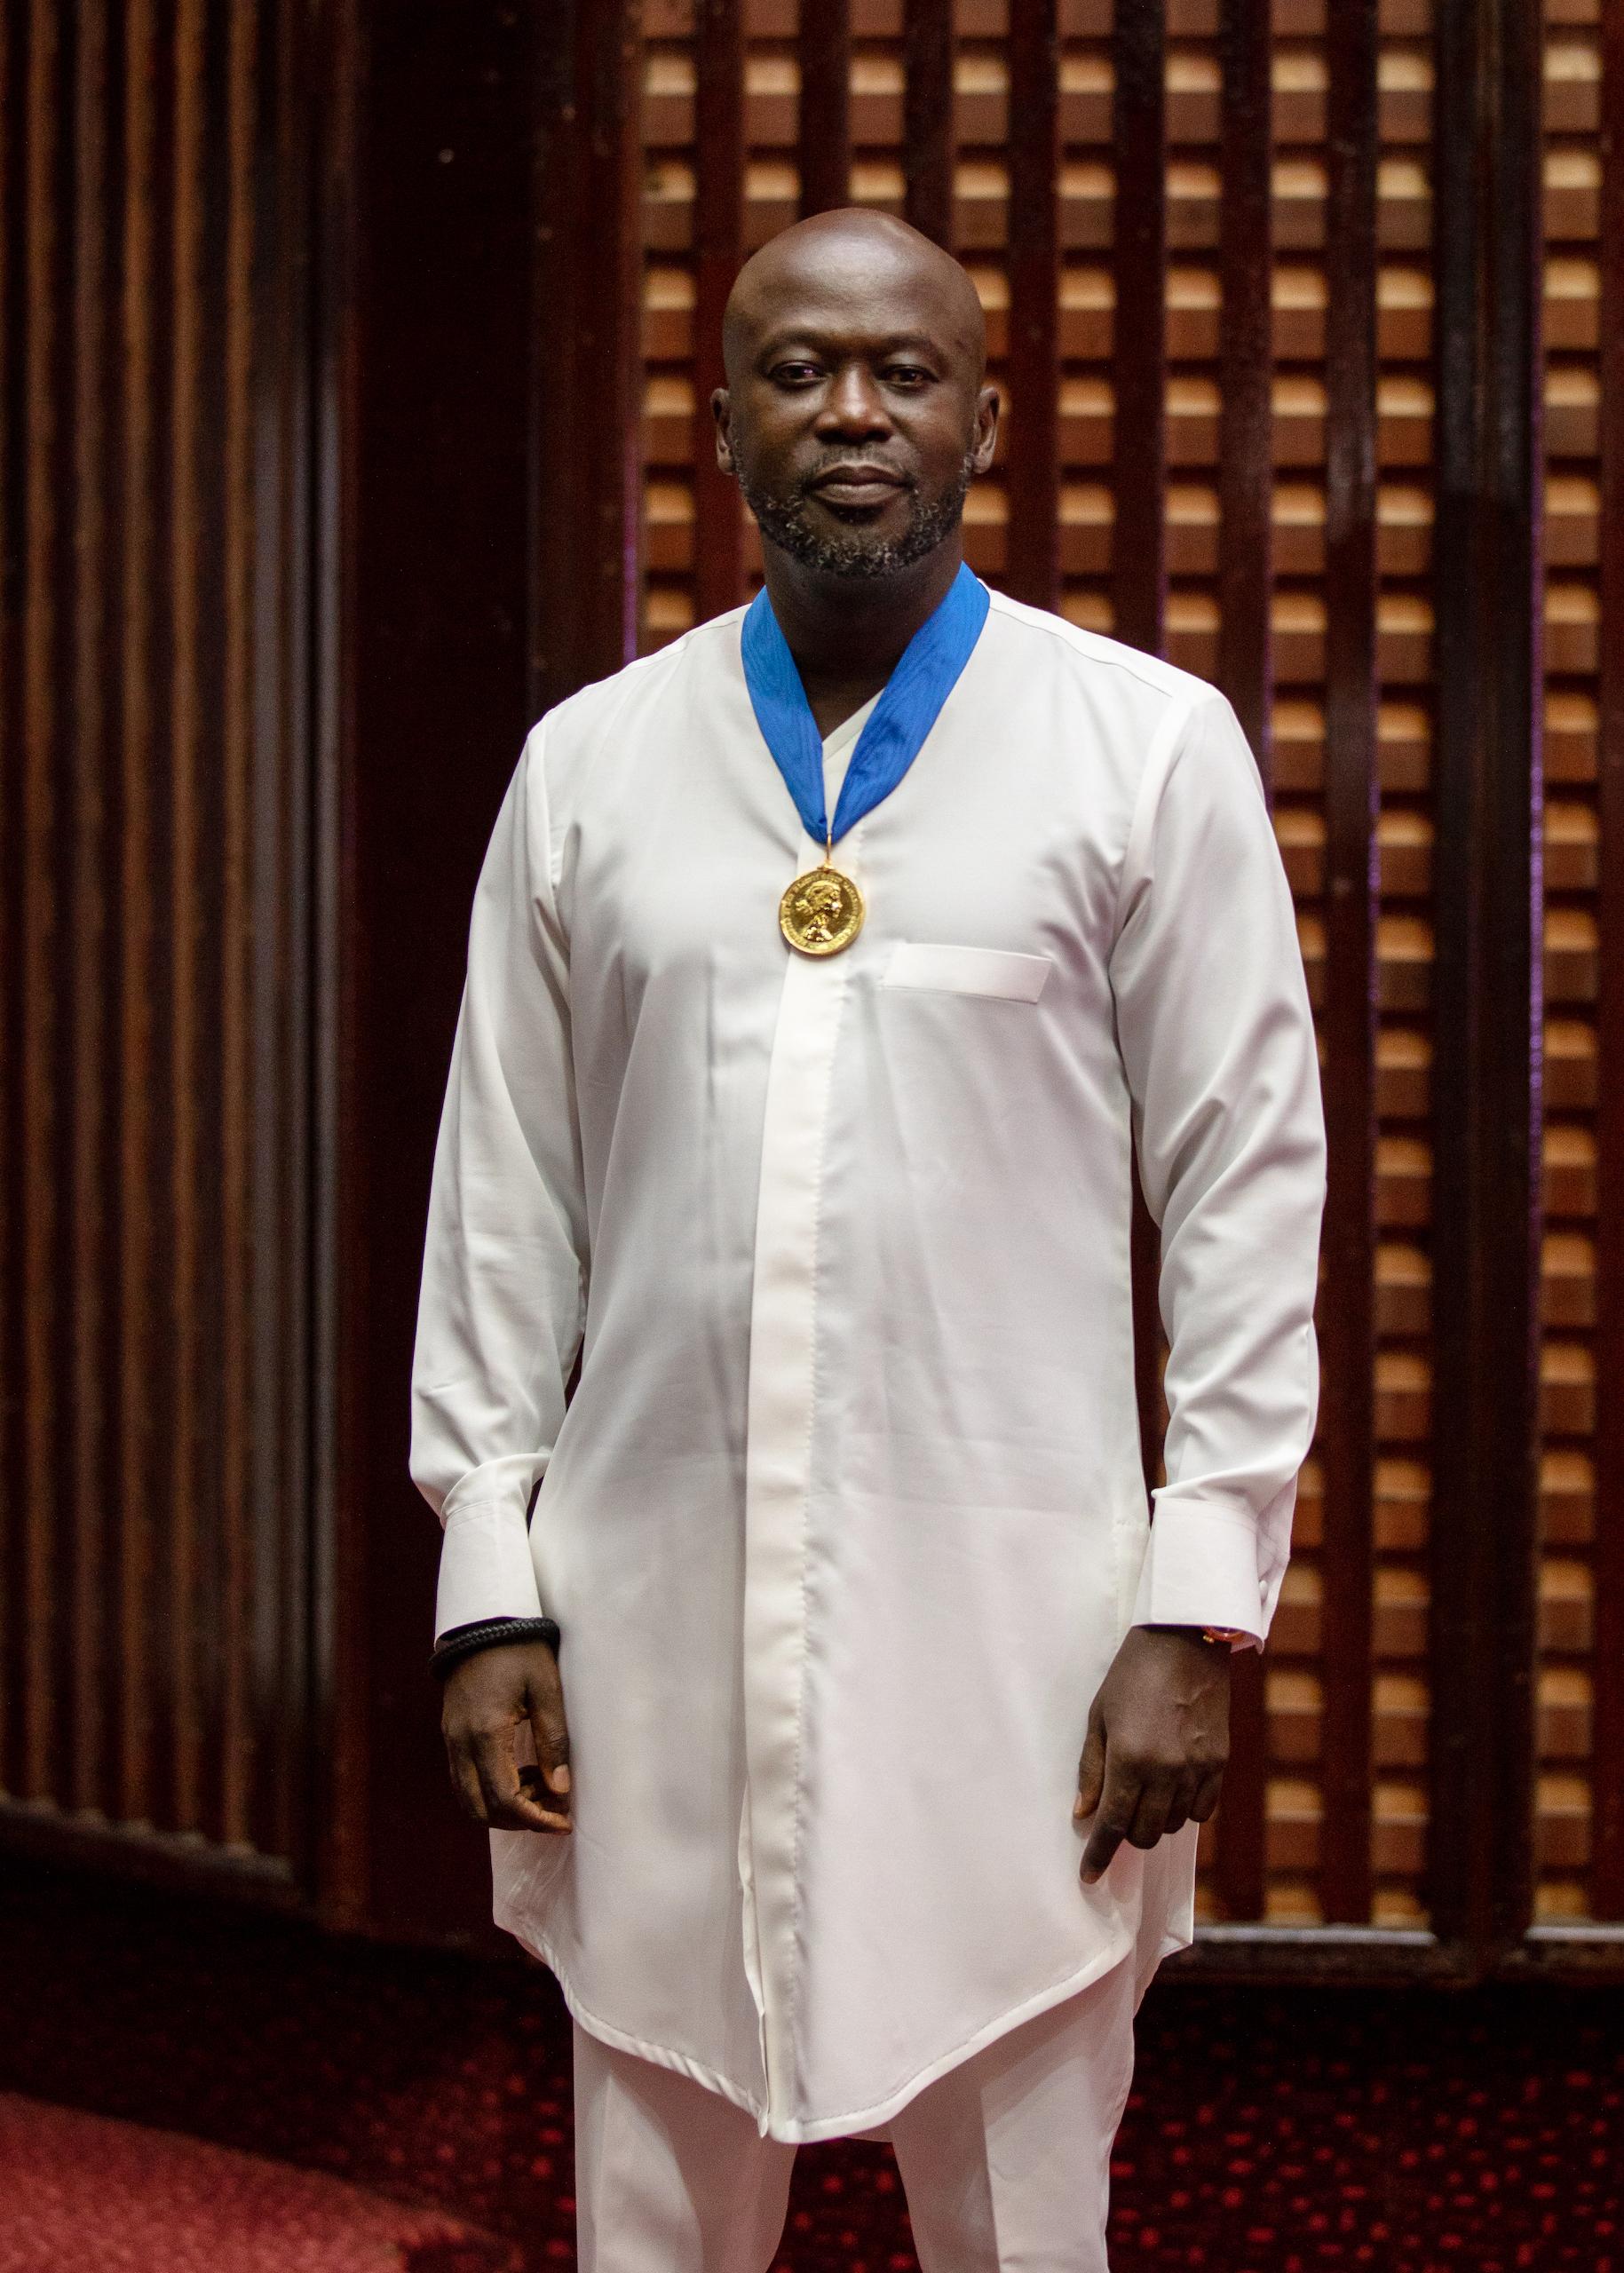 Ghanaian-British Architect Sir David Adjaye receiving the RIBA 2021 Royal Gold Medal for Architecture